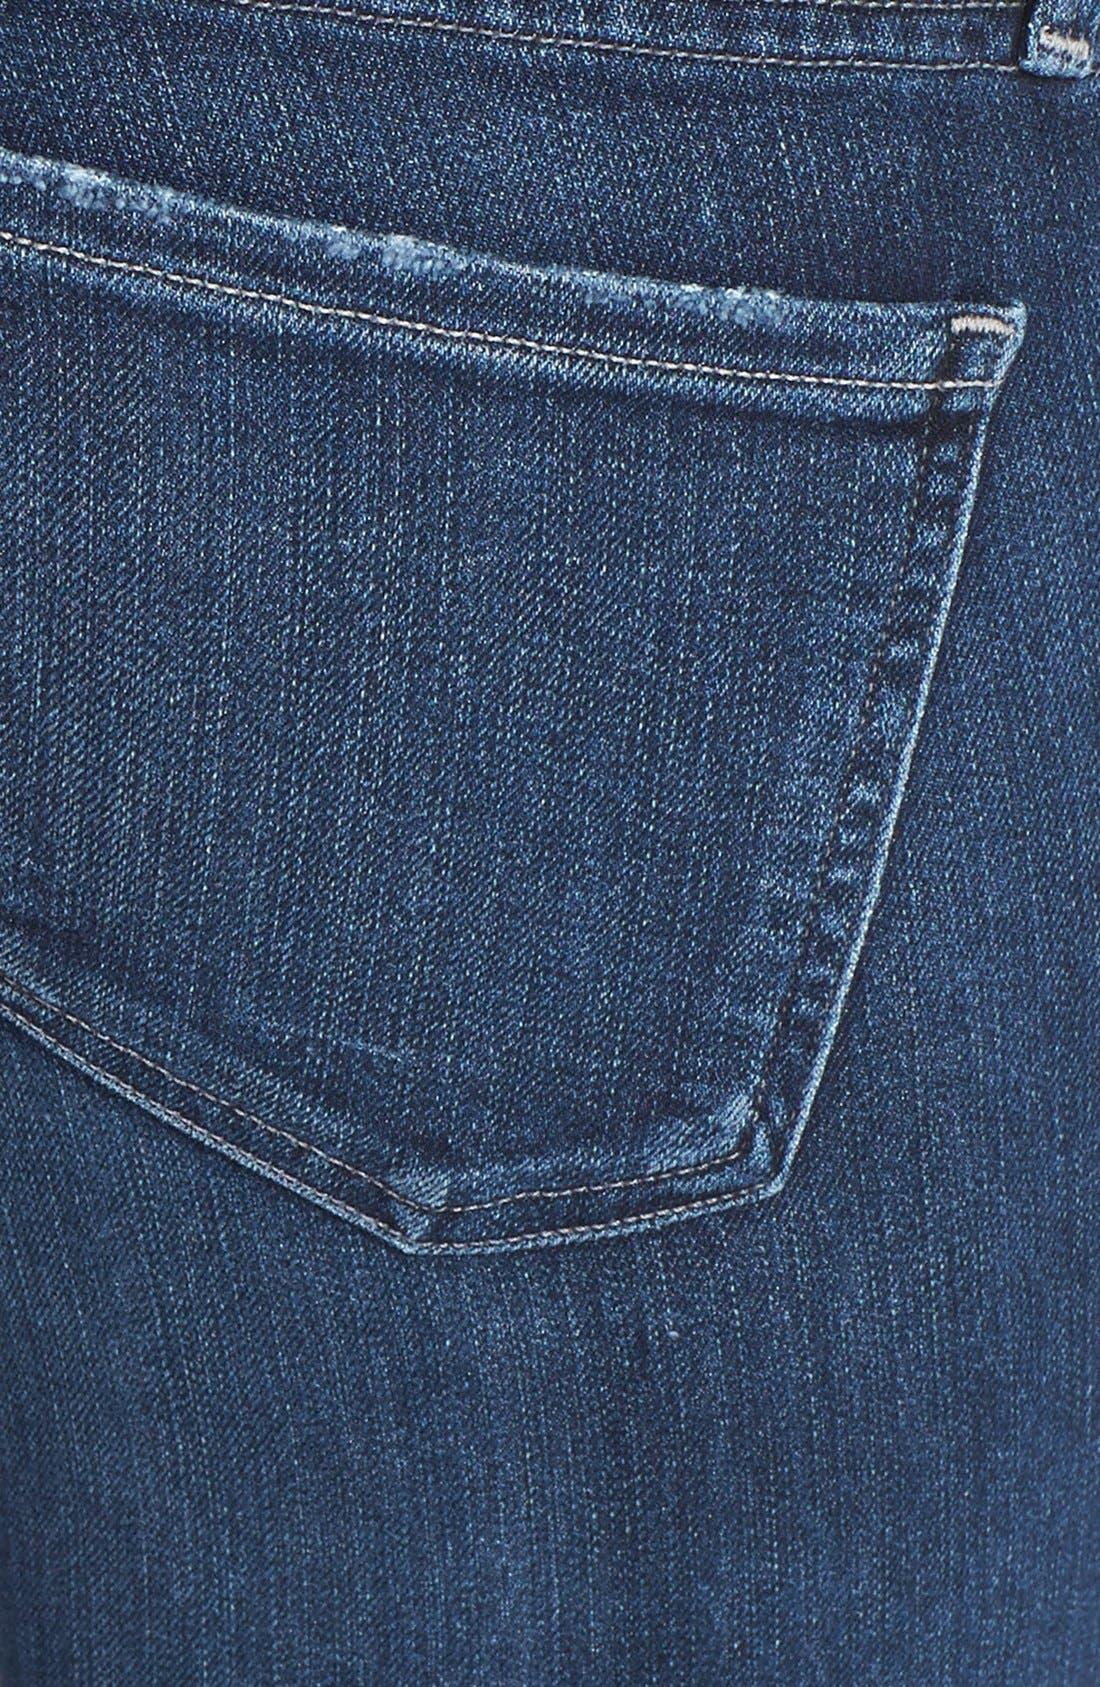 Arielle Slim Jeans,                             Alternate thumbnail 3, color,                             Hewett